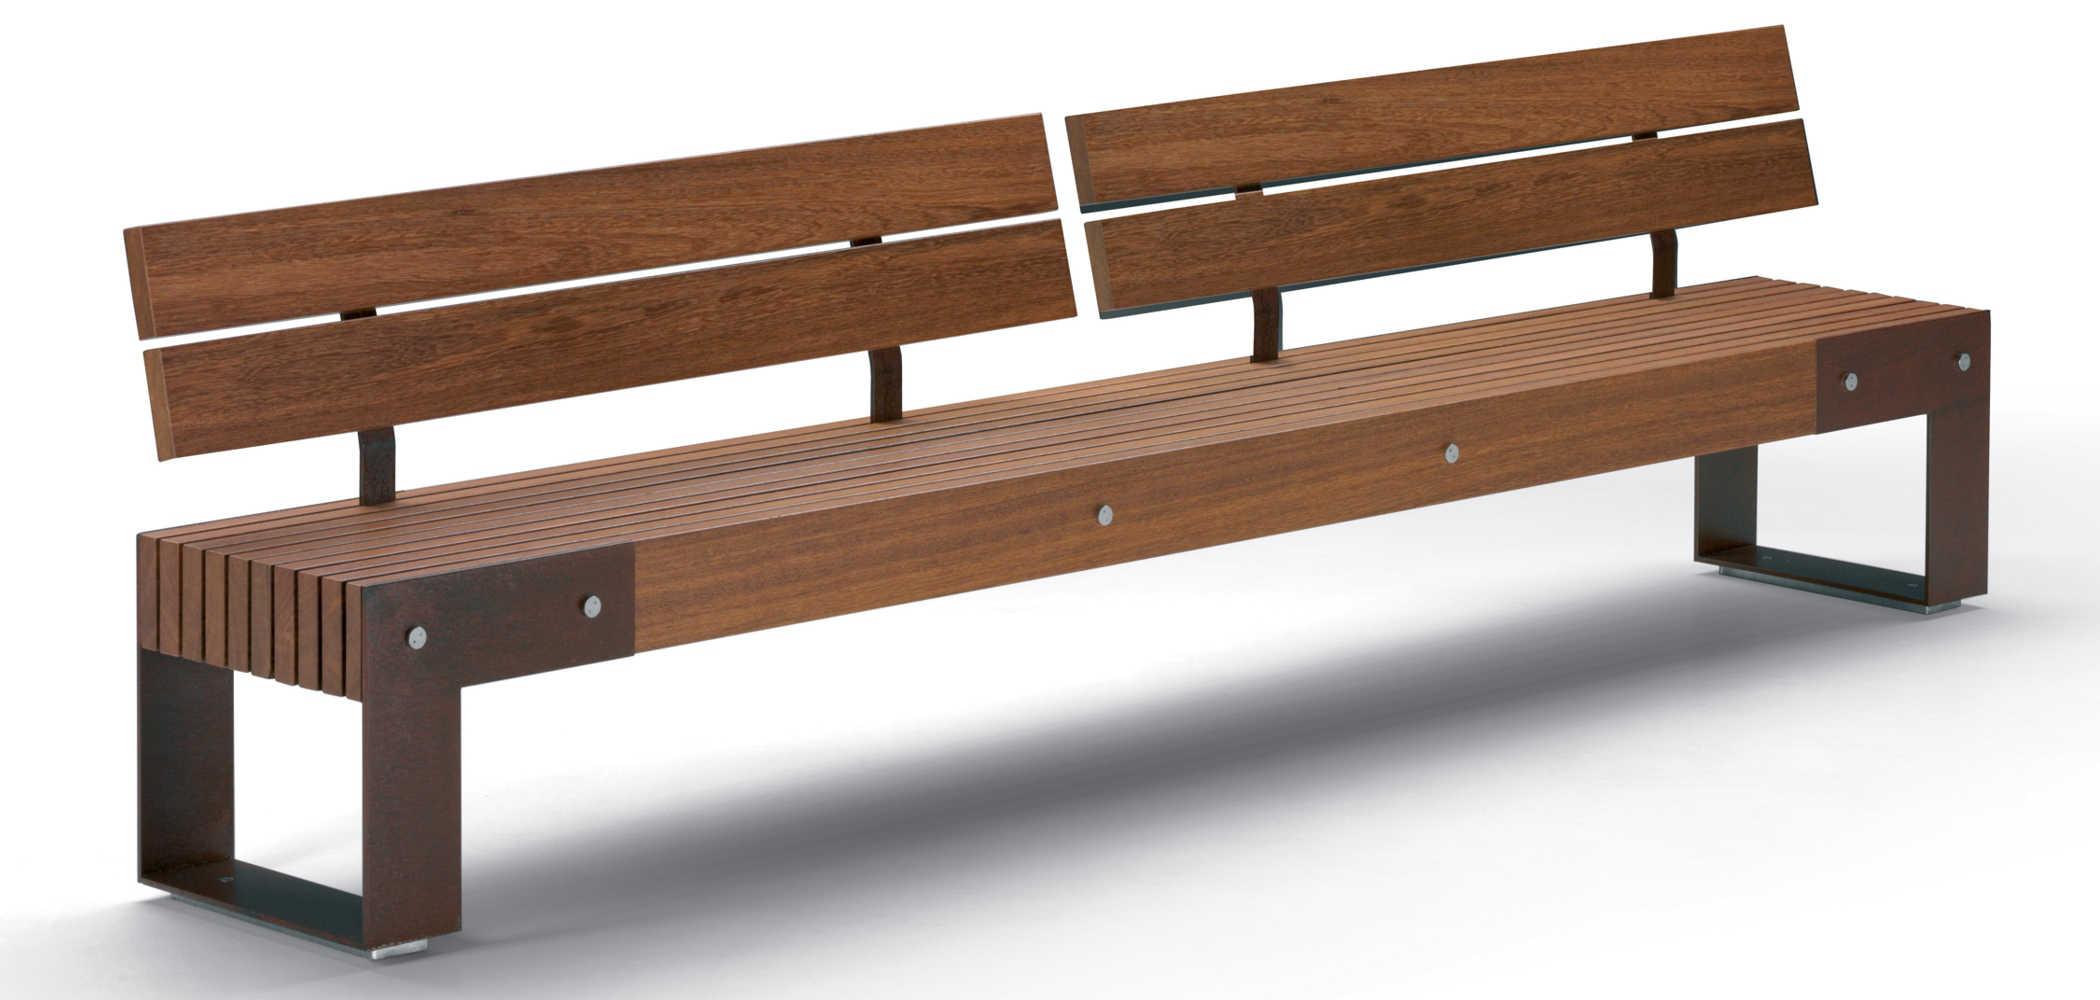 Panchine in legno ideas lt metalco for Panchine da giardino amazon